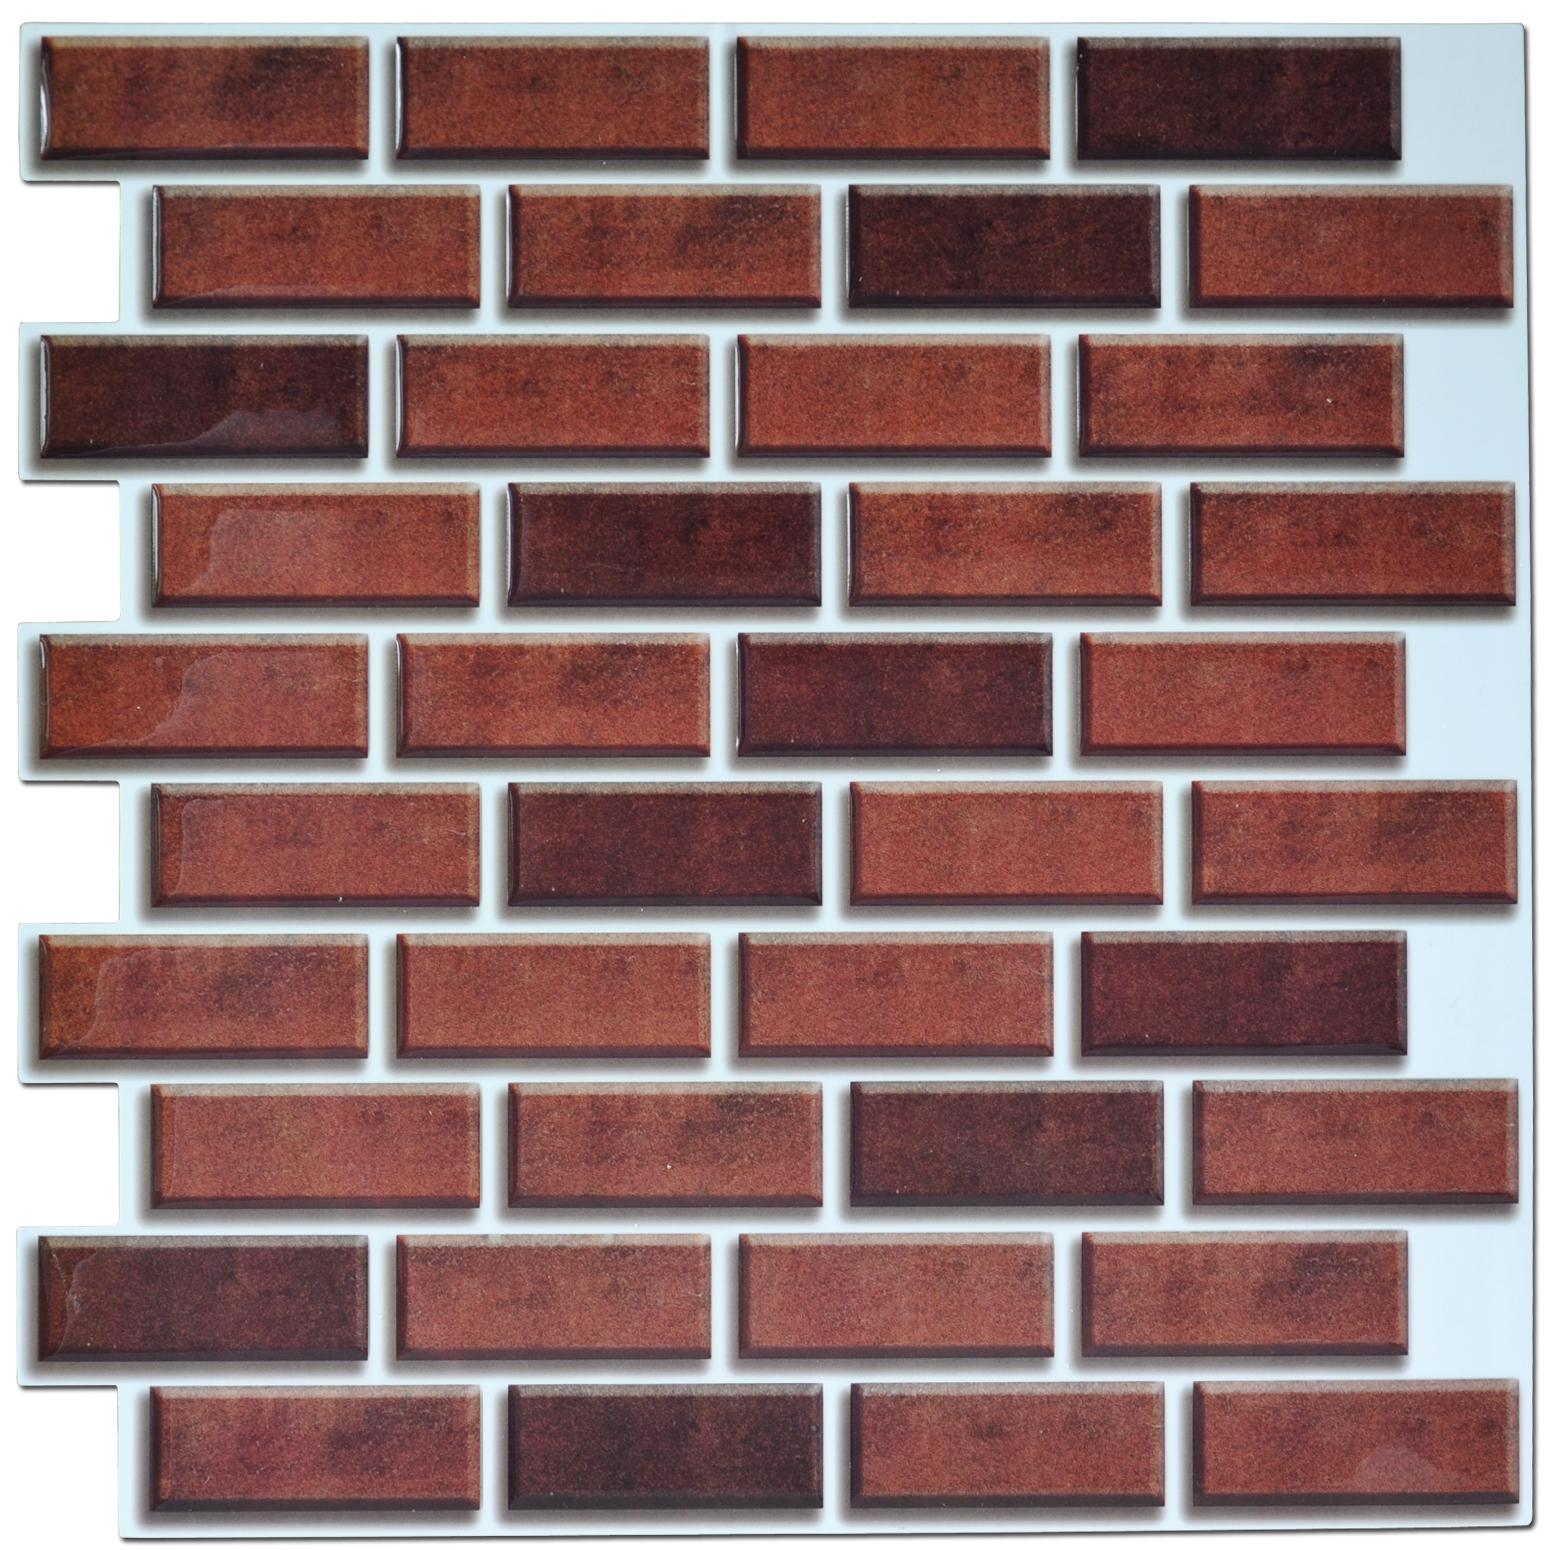 - 3d Smart Wall Tiles - Metro Brick Effect Smart Tiles Lowes - Buy Red